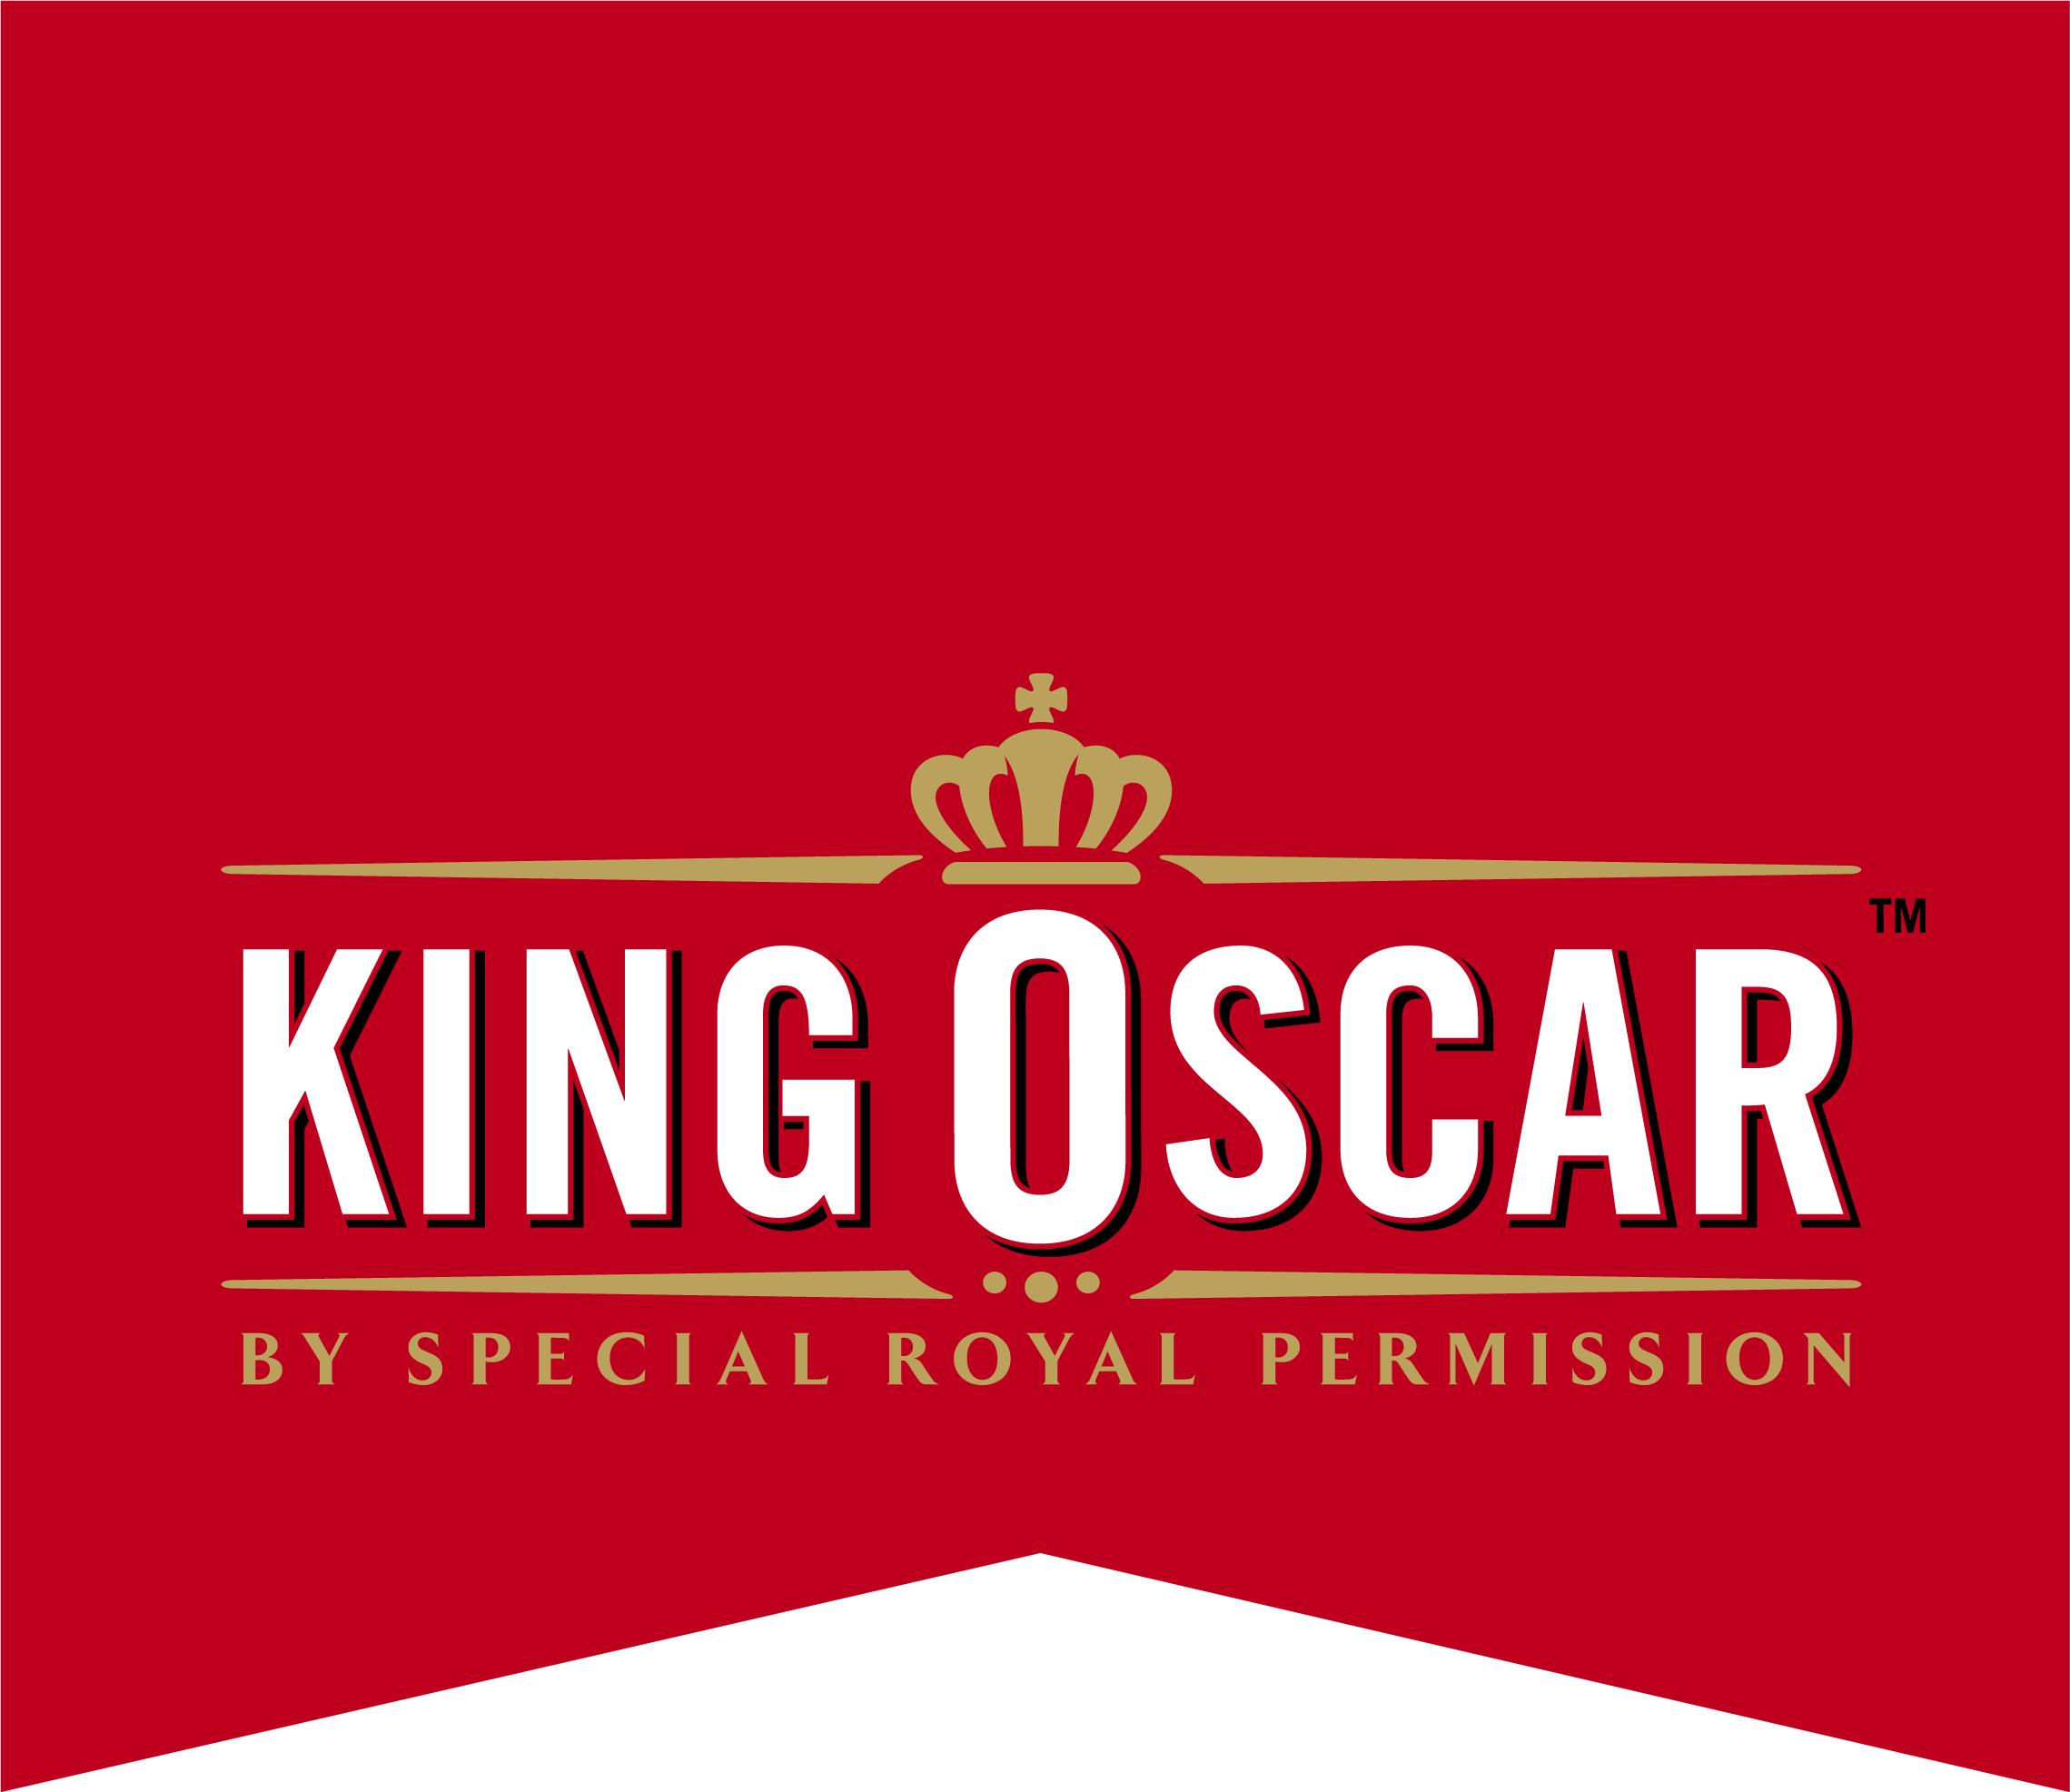 King Oscar logo